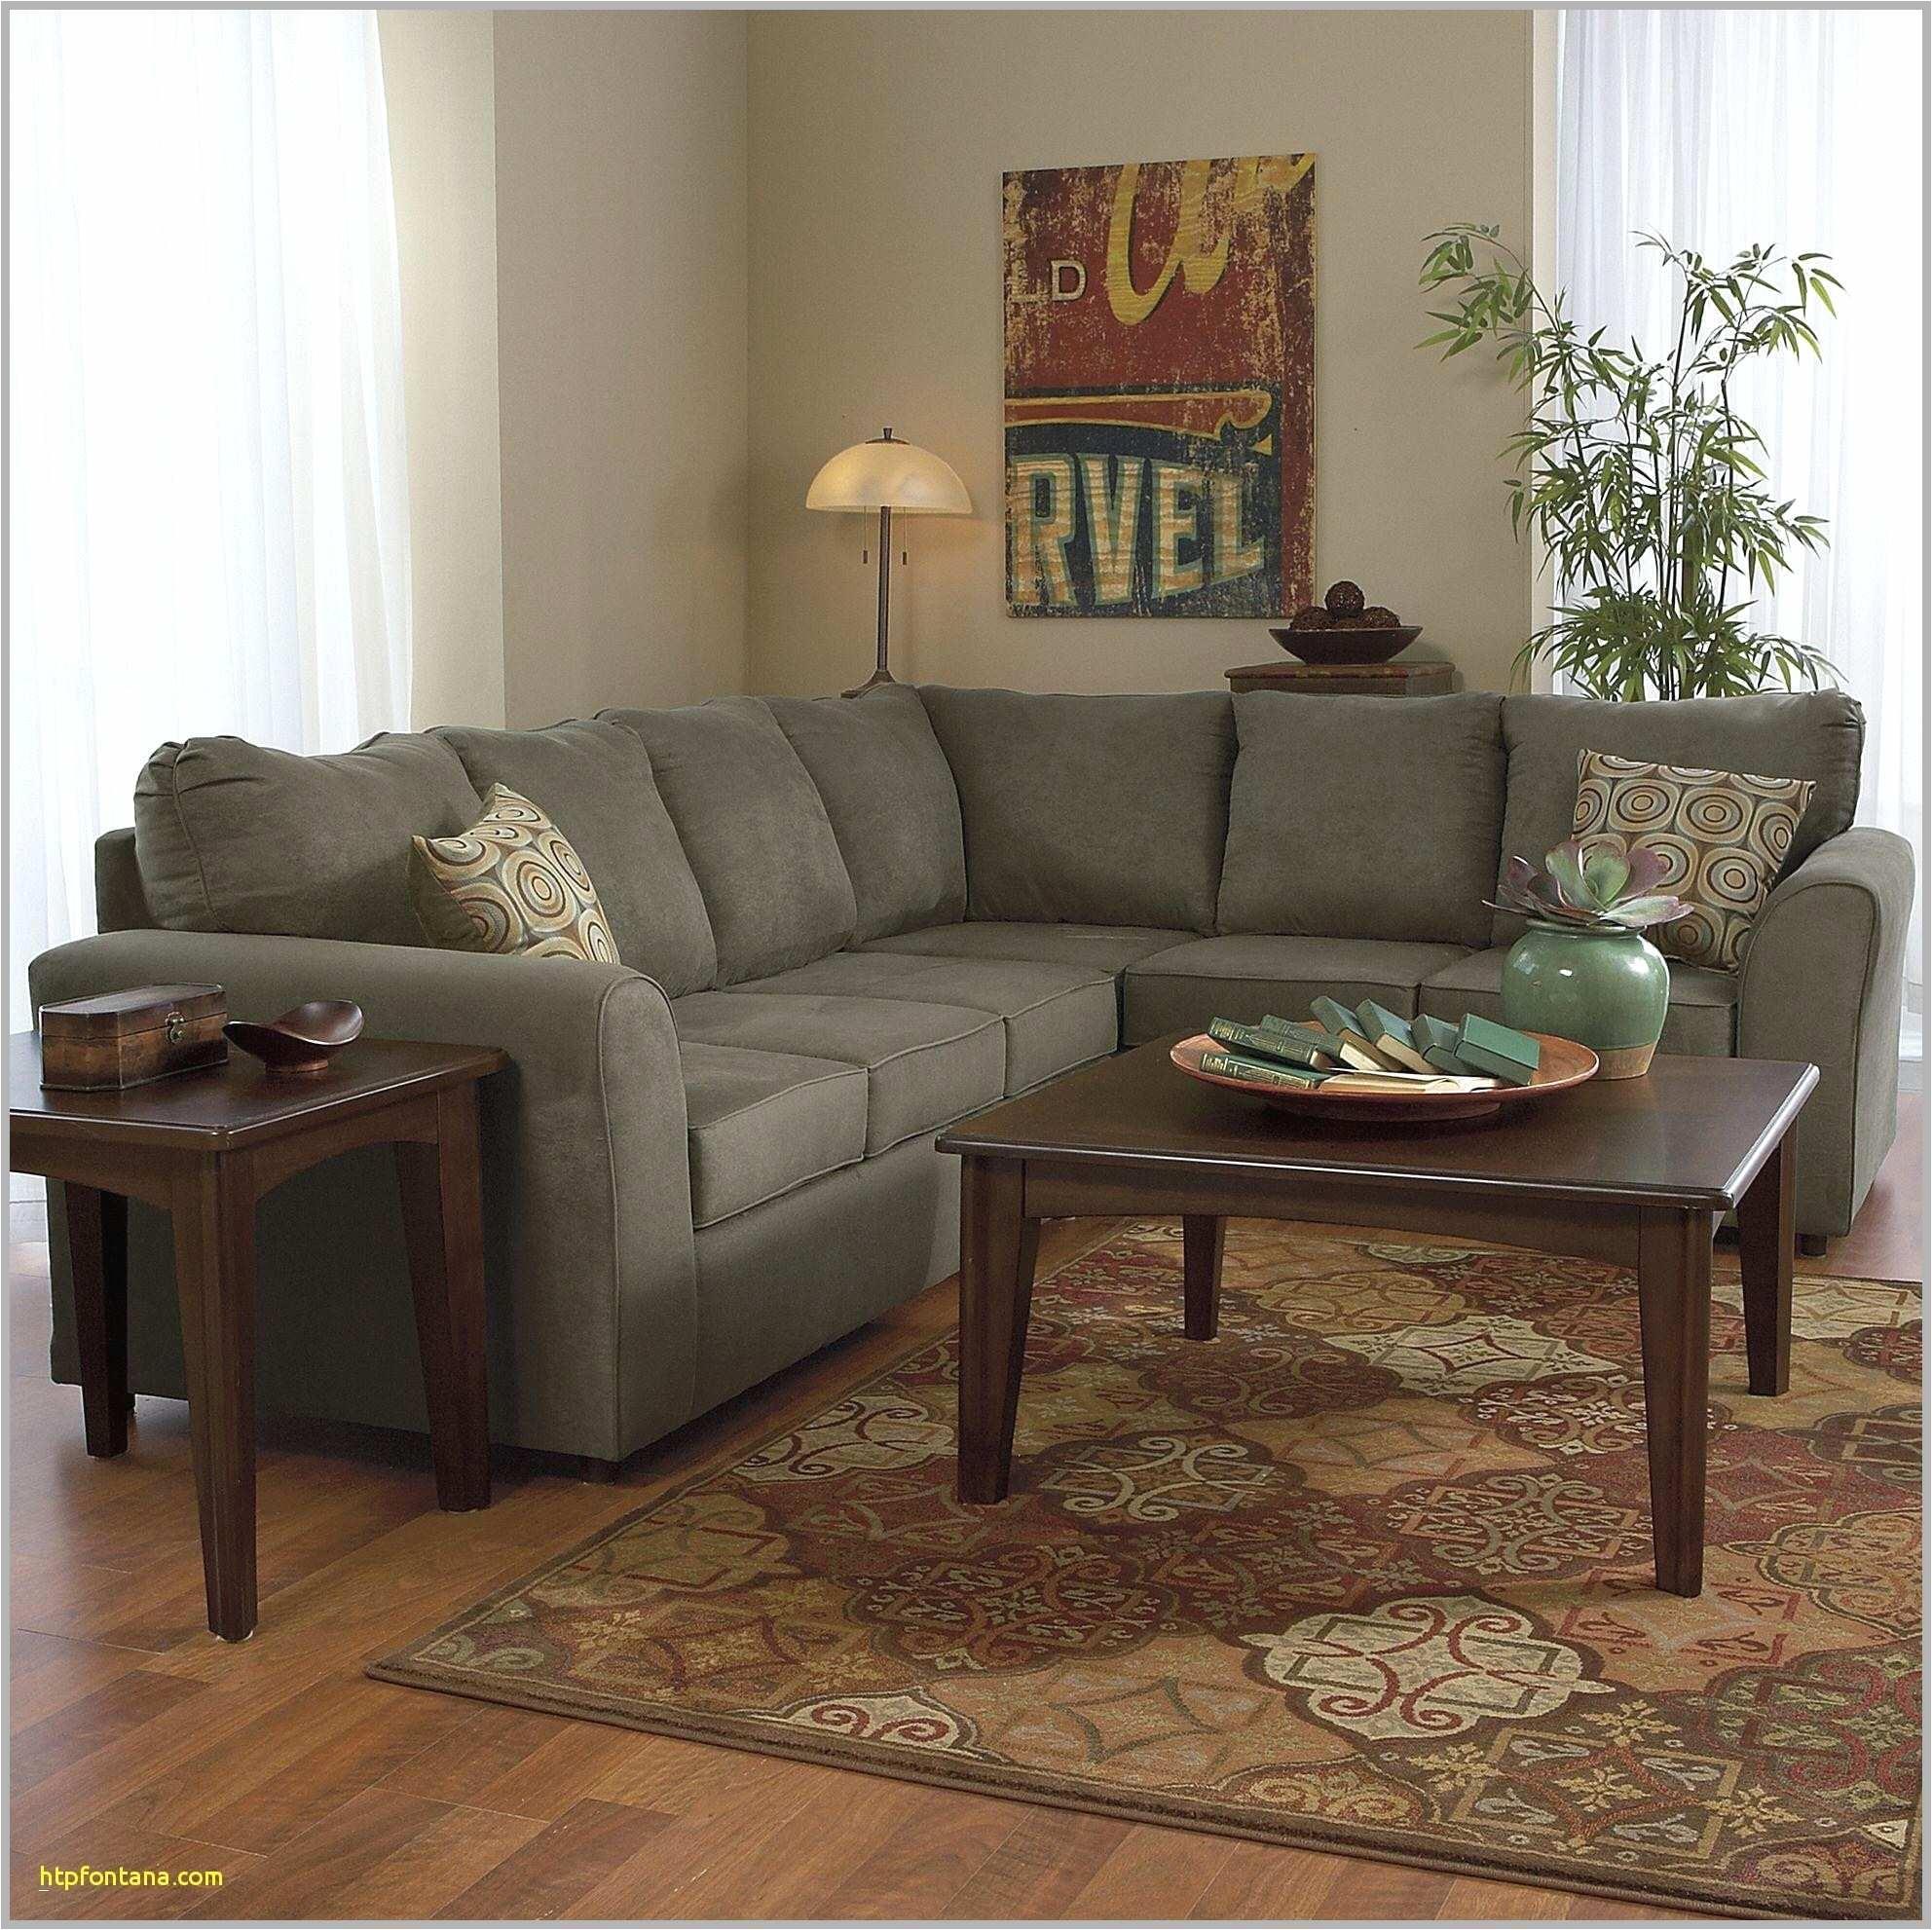 Living Room Design Image Fresh Furniture Sleeper Loveseat New Wicker Outdoor sofa 0d Patio Unique 25